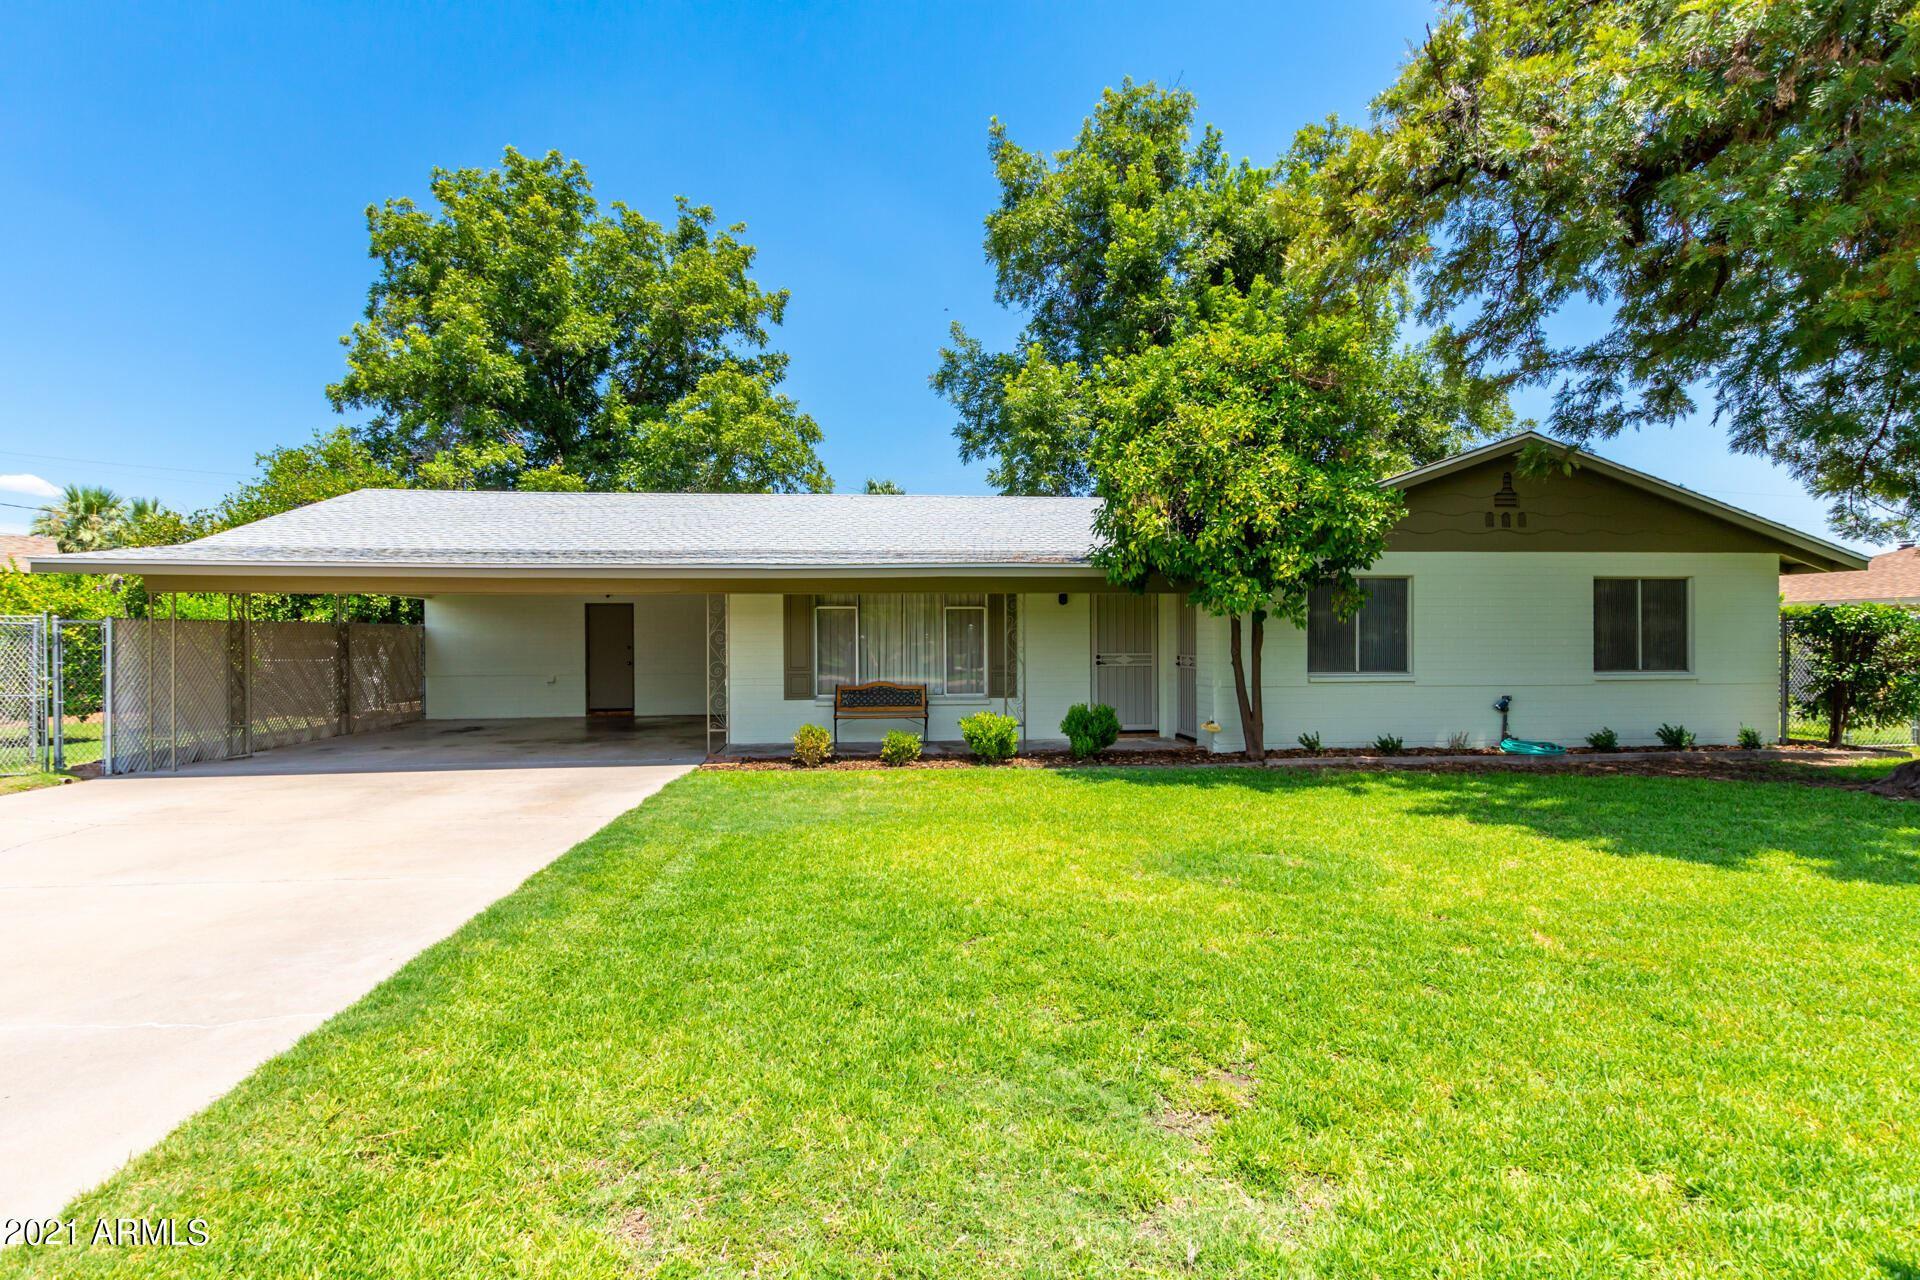 4529 N 28TH Place, Phoenix, AZ 85016 - MLS#: 6254770